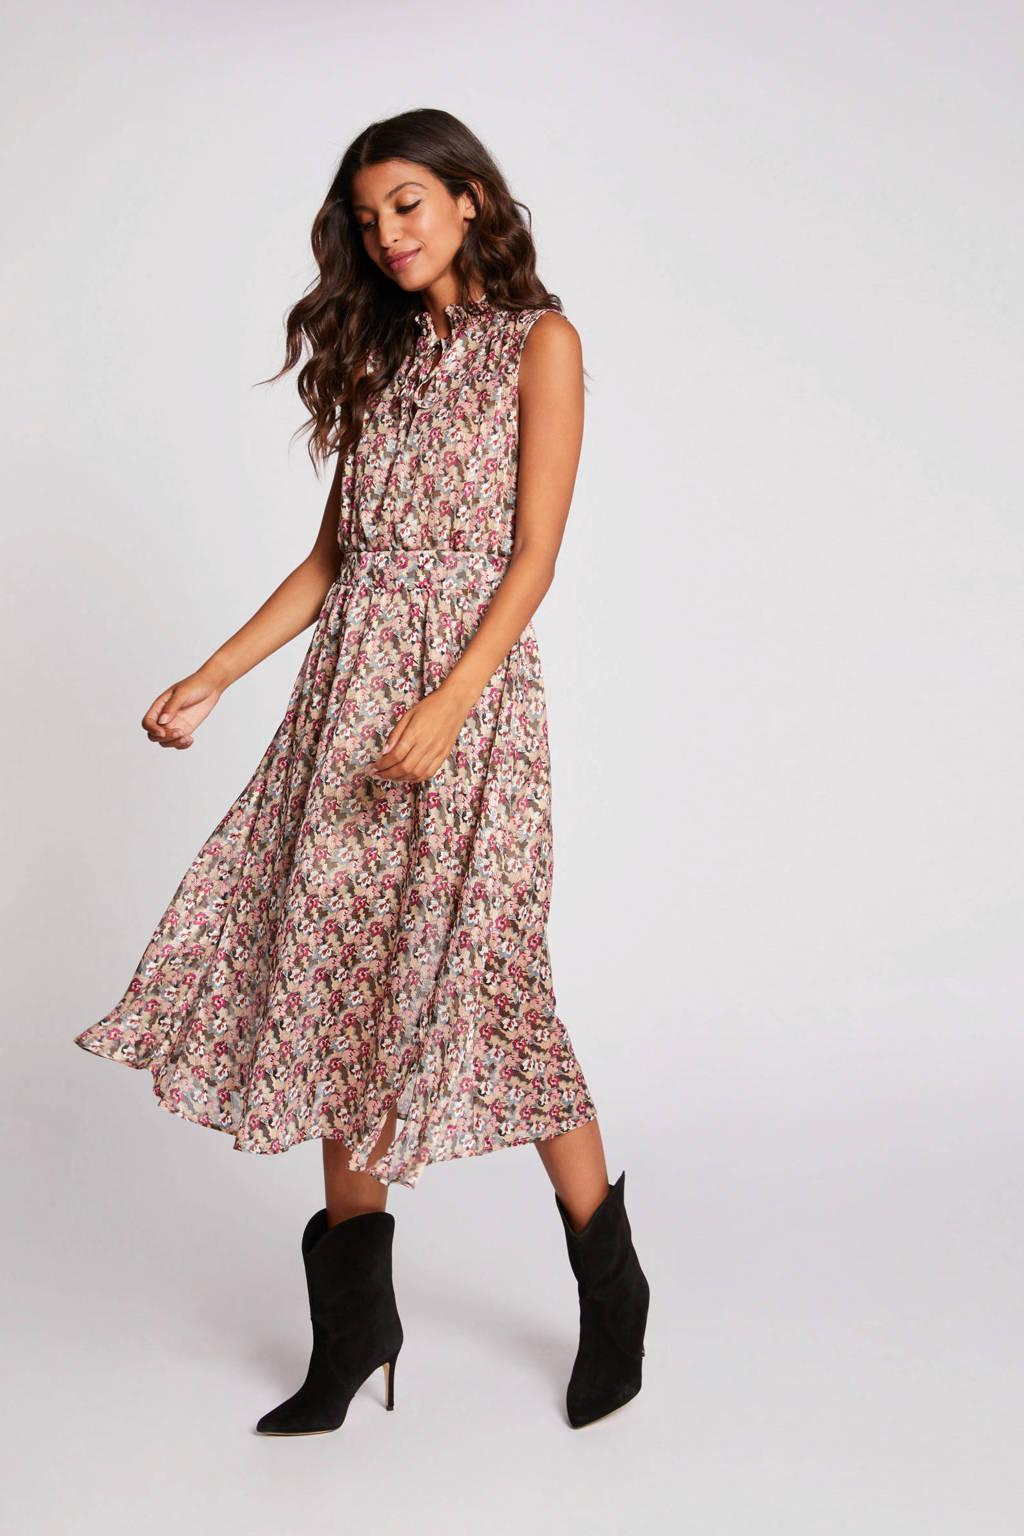 Morgan gebloemde semi-transparante jurk beige/fuchsia/wit, Beige/fuchsia/wit